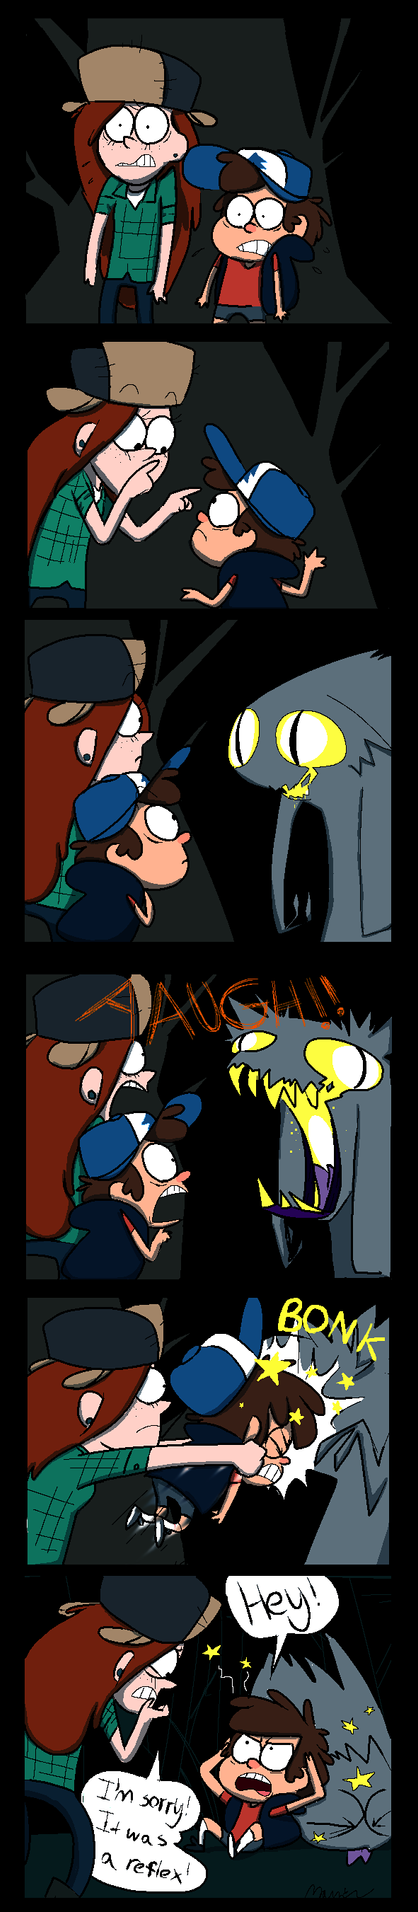 BONK! (Gravity Falls Comic) by PurplePassion3